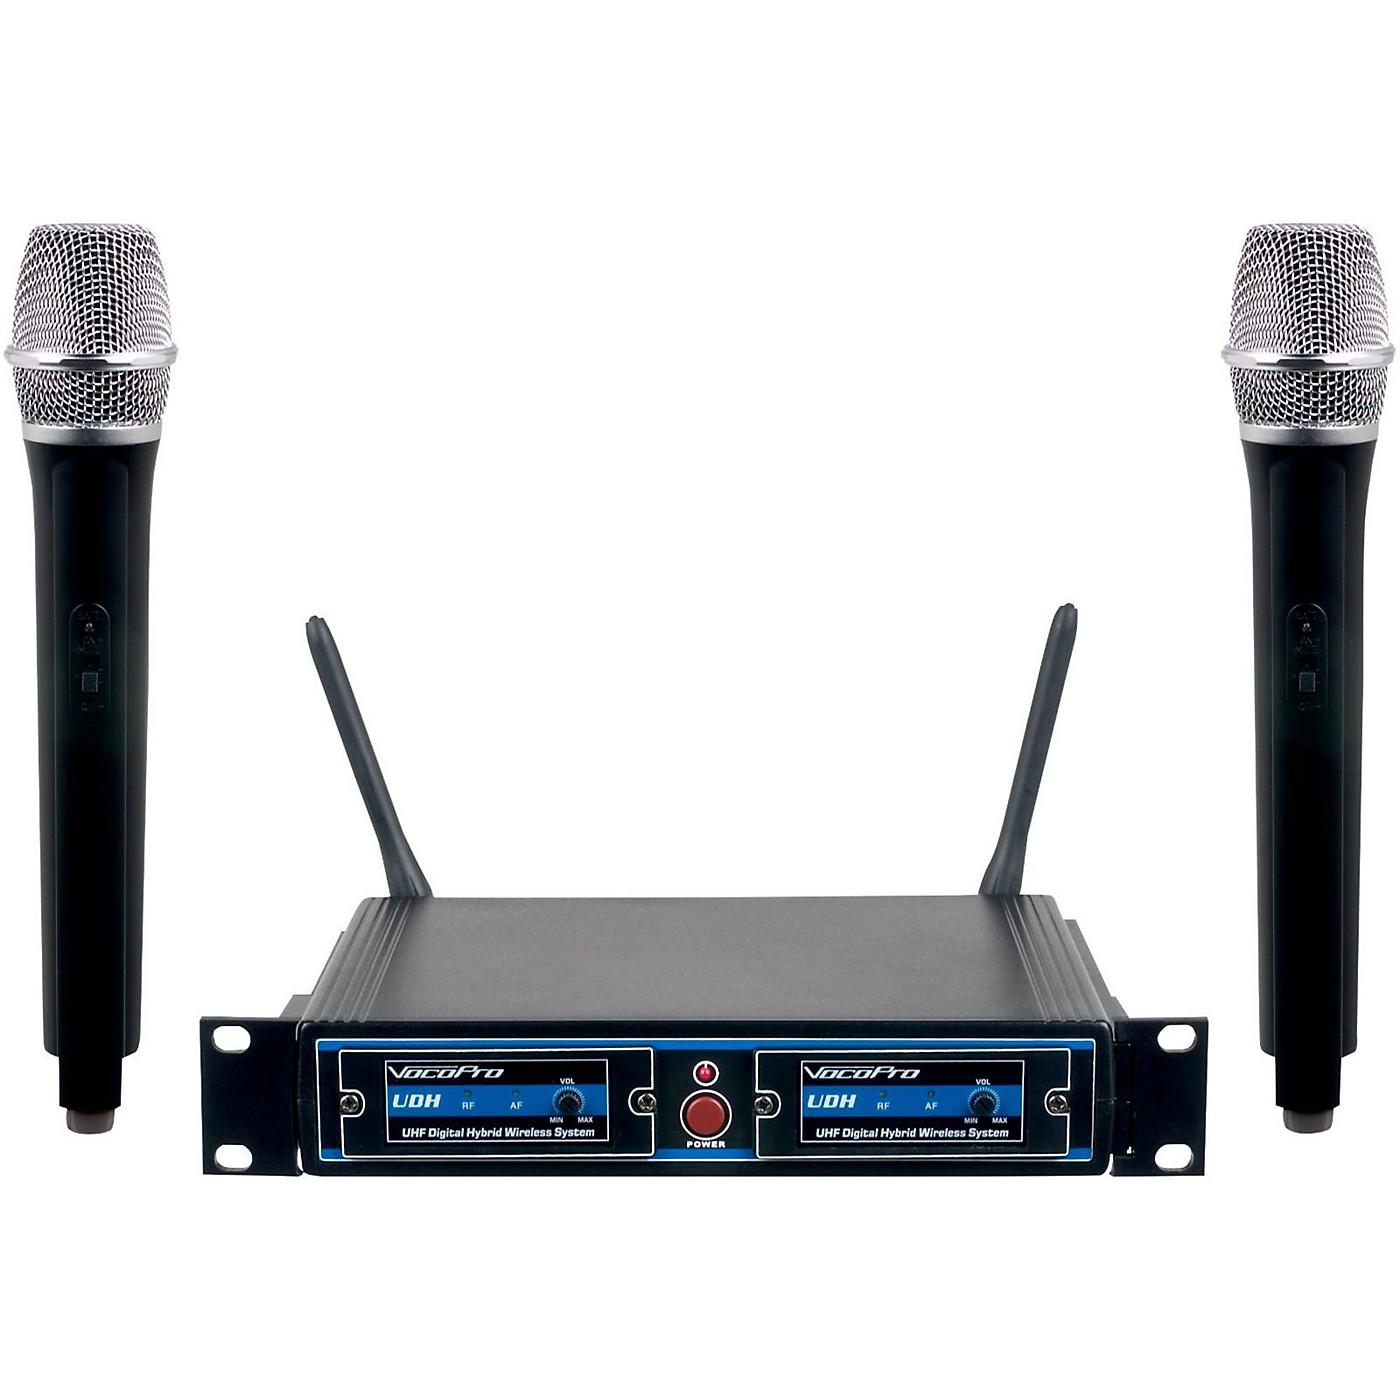 Vocopro UDH-DUAL-H Hybrid Wireless System thumbnail